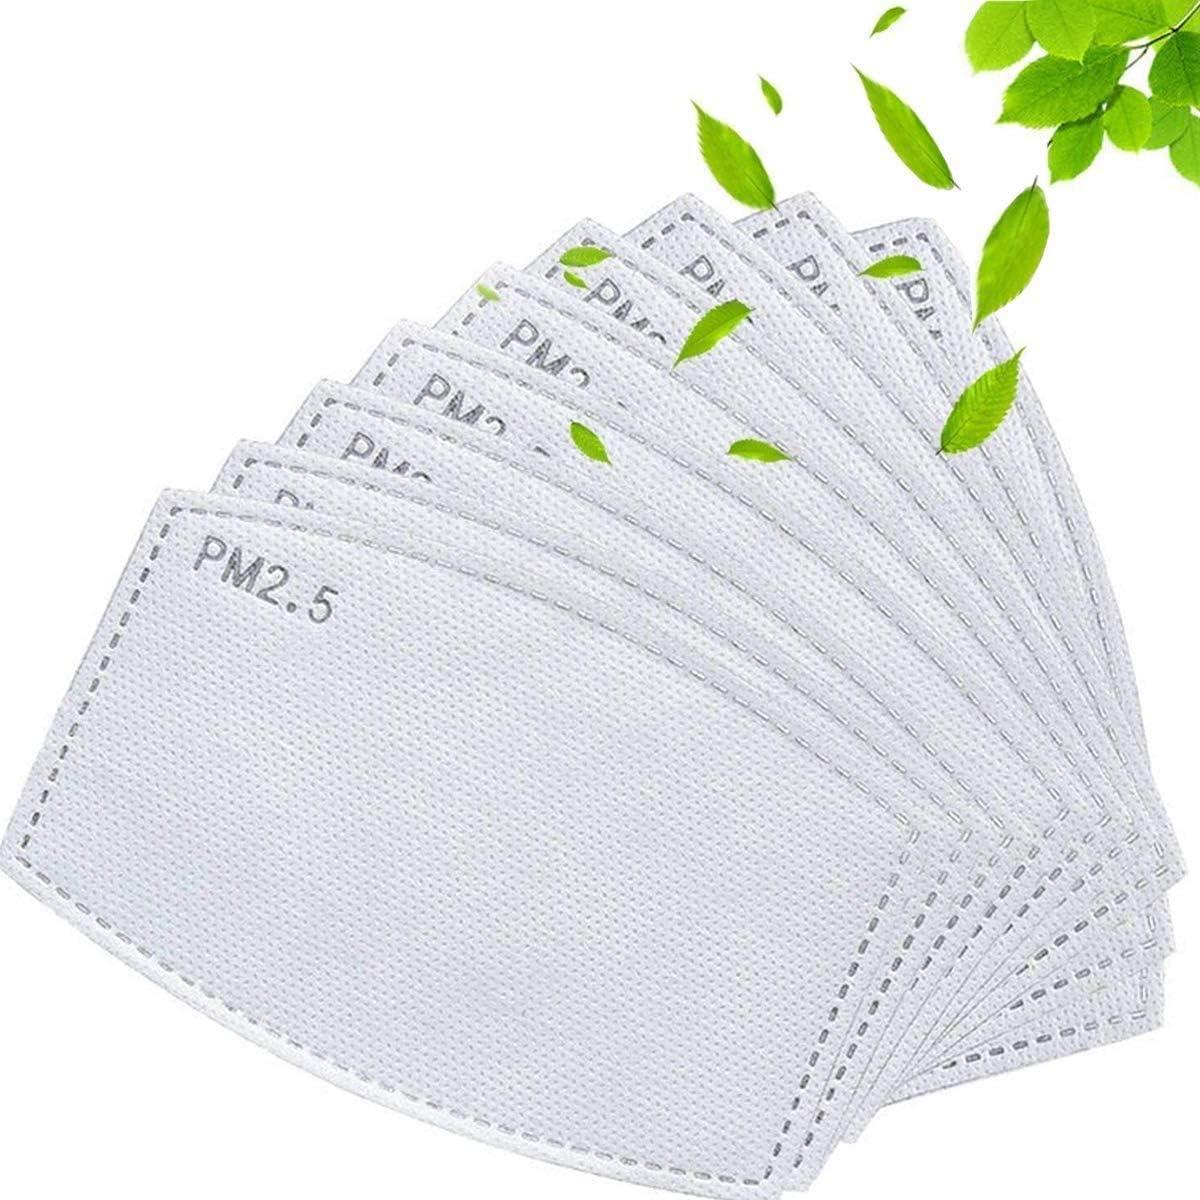 30 PCS Activated Carbon Filter Replaceable Anti Haze Filter